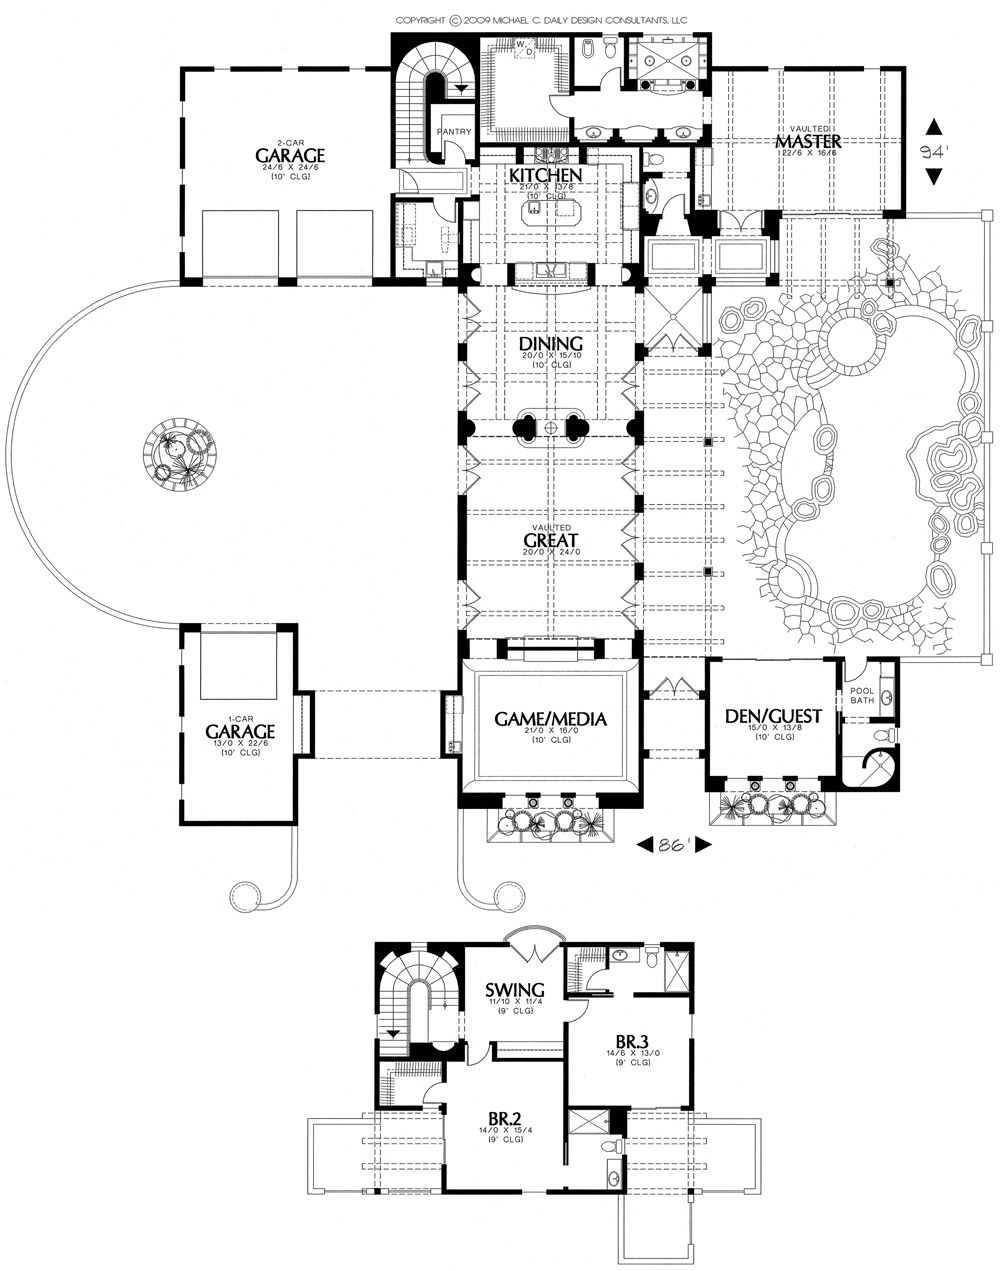 House DesignHome Plans House Plan Courtyard Home Plansanta Fe